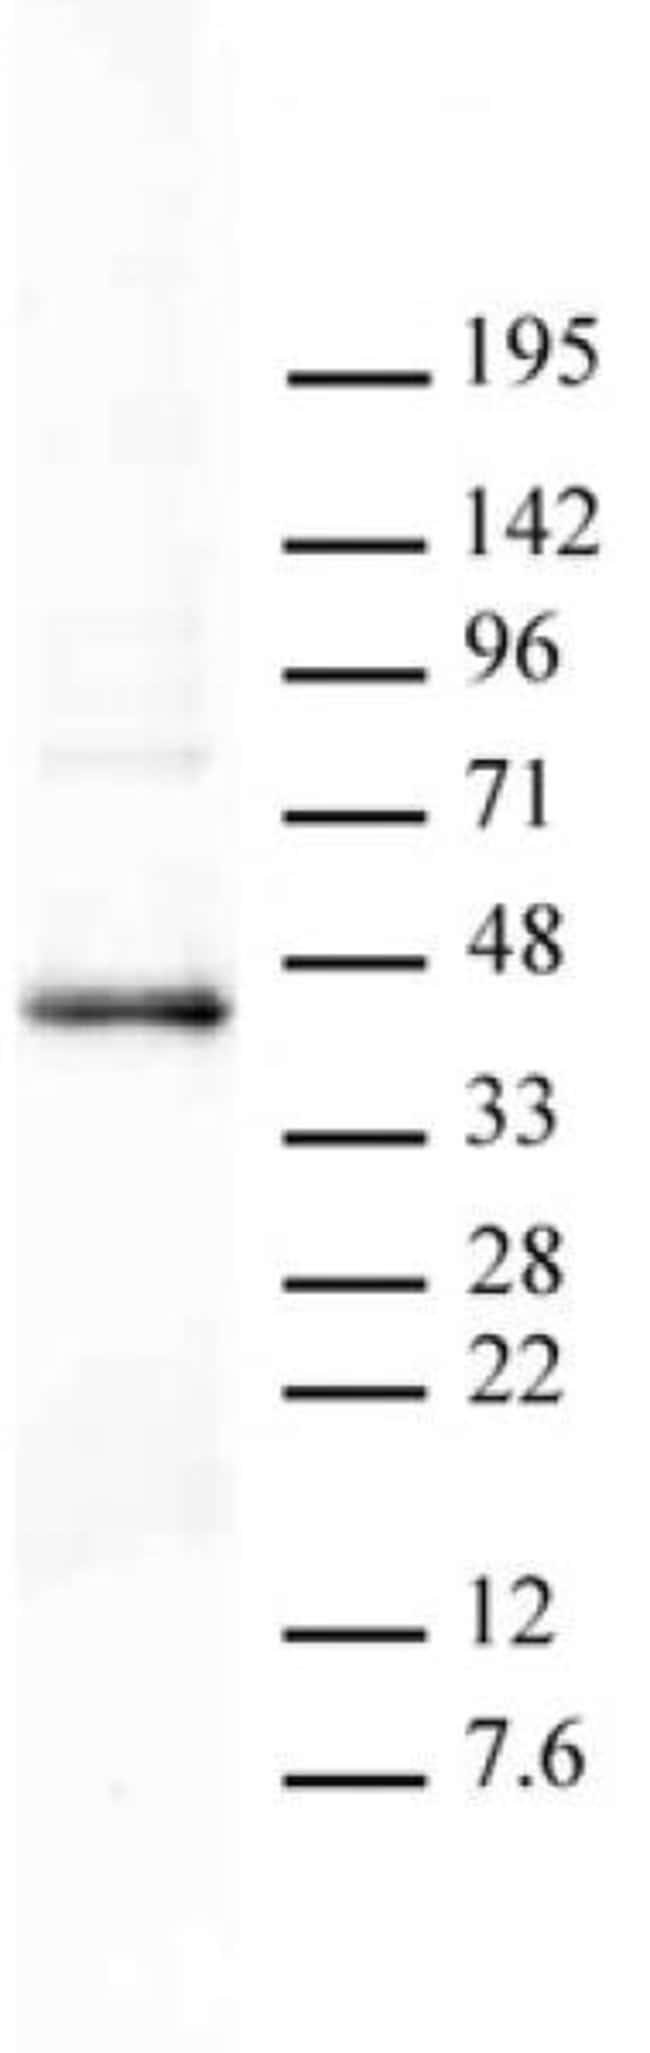 PRMT6 Rabbit anti-Human, Unconjugated, Polyclonal, Active Motif:Antibodies:Primary